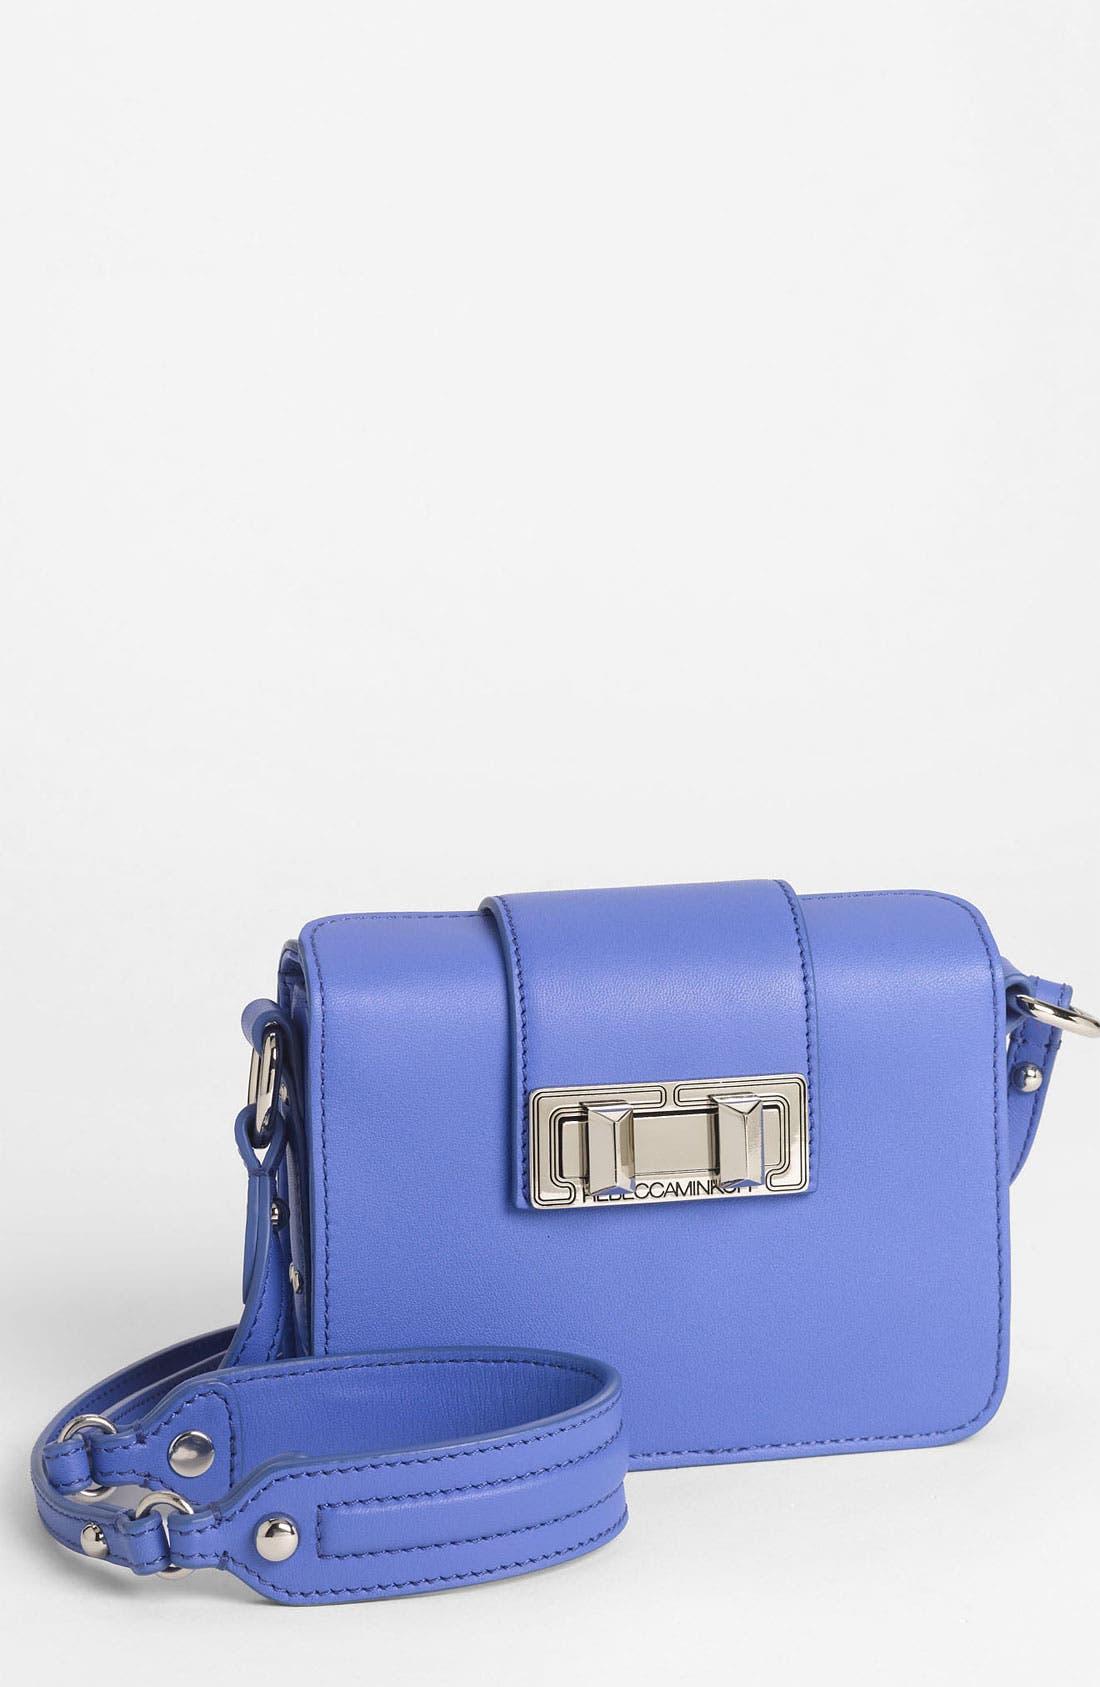 Main Image - Rebecca Minkoff 'Box - Mini' Crossbody Bag